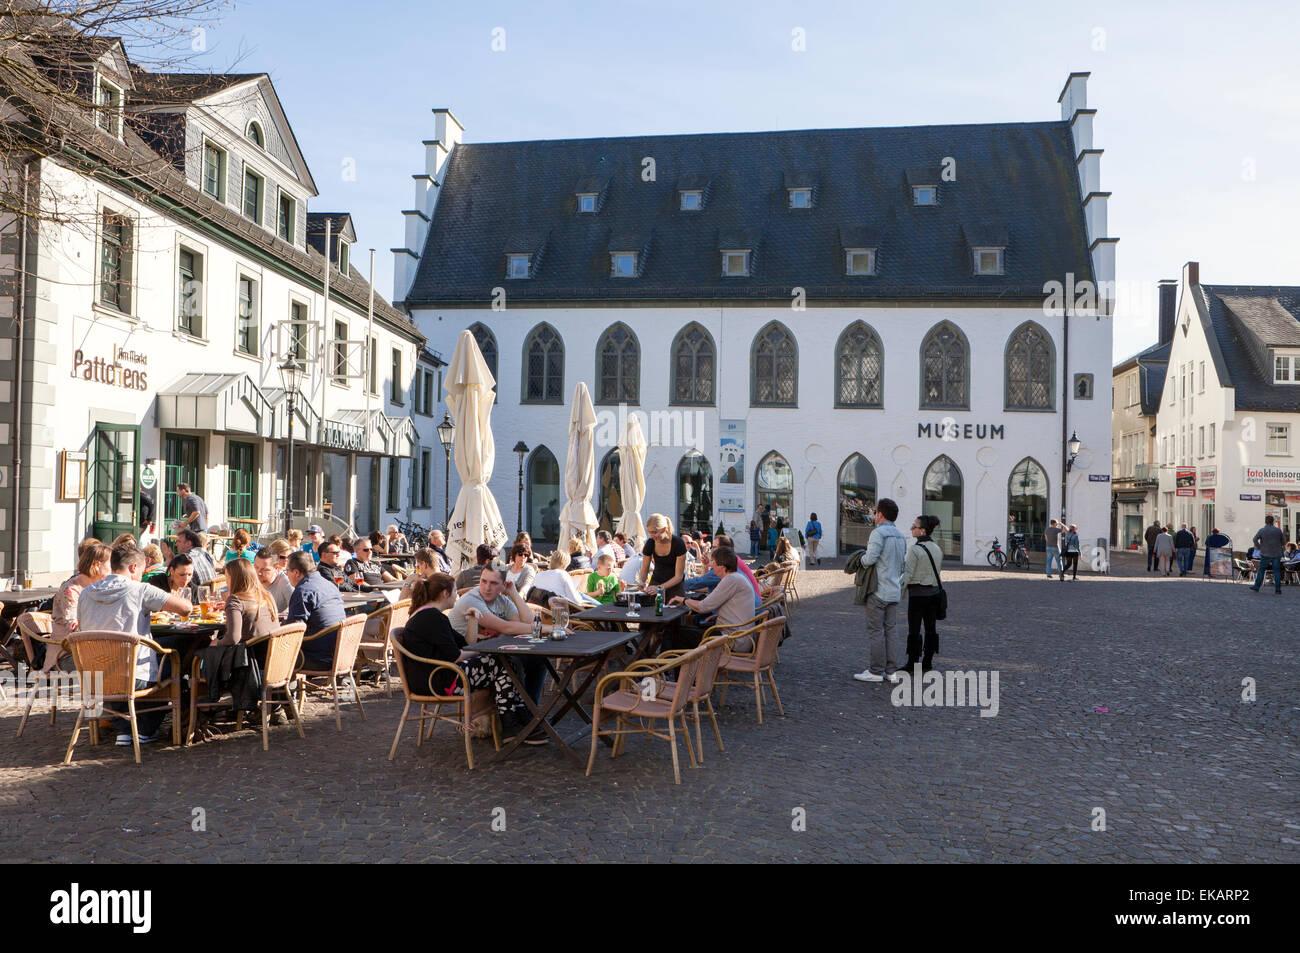 Restaurant and museum at the Alter Markt square, Hanseatic City of Attendorn, Sauerland region, North Rhine-Westphalia, Stock Photo